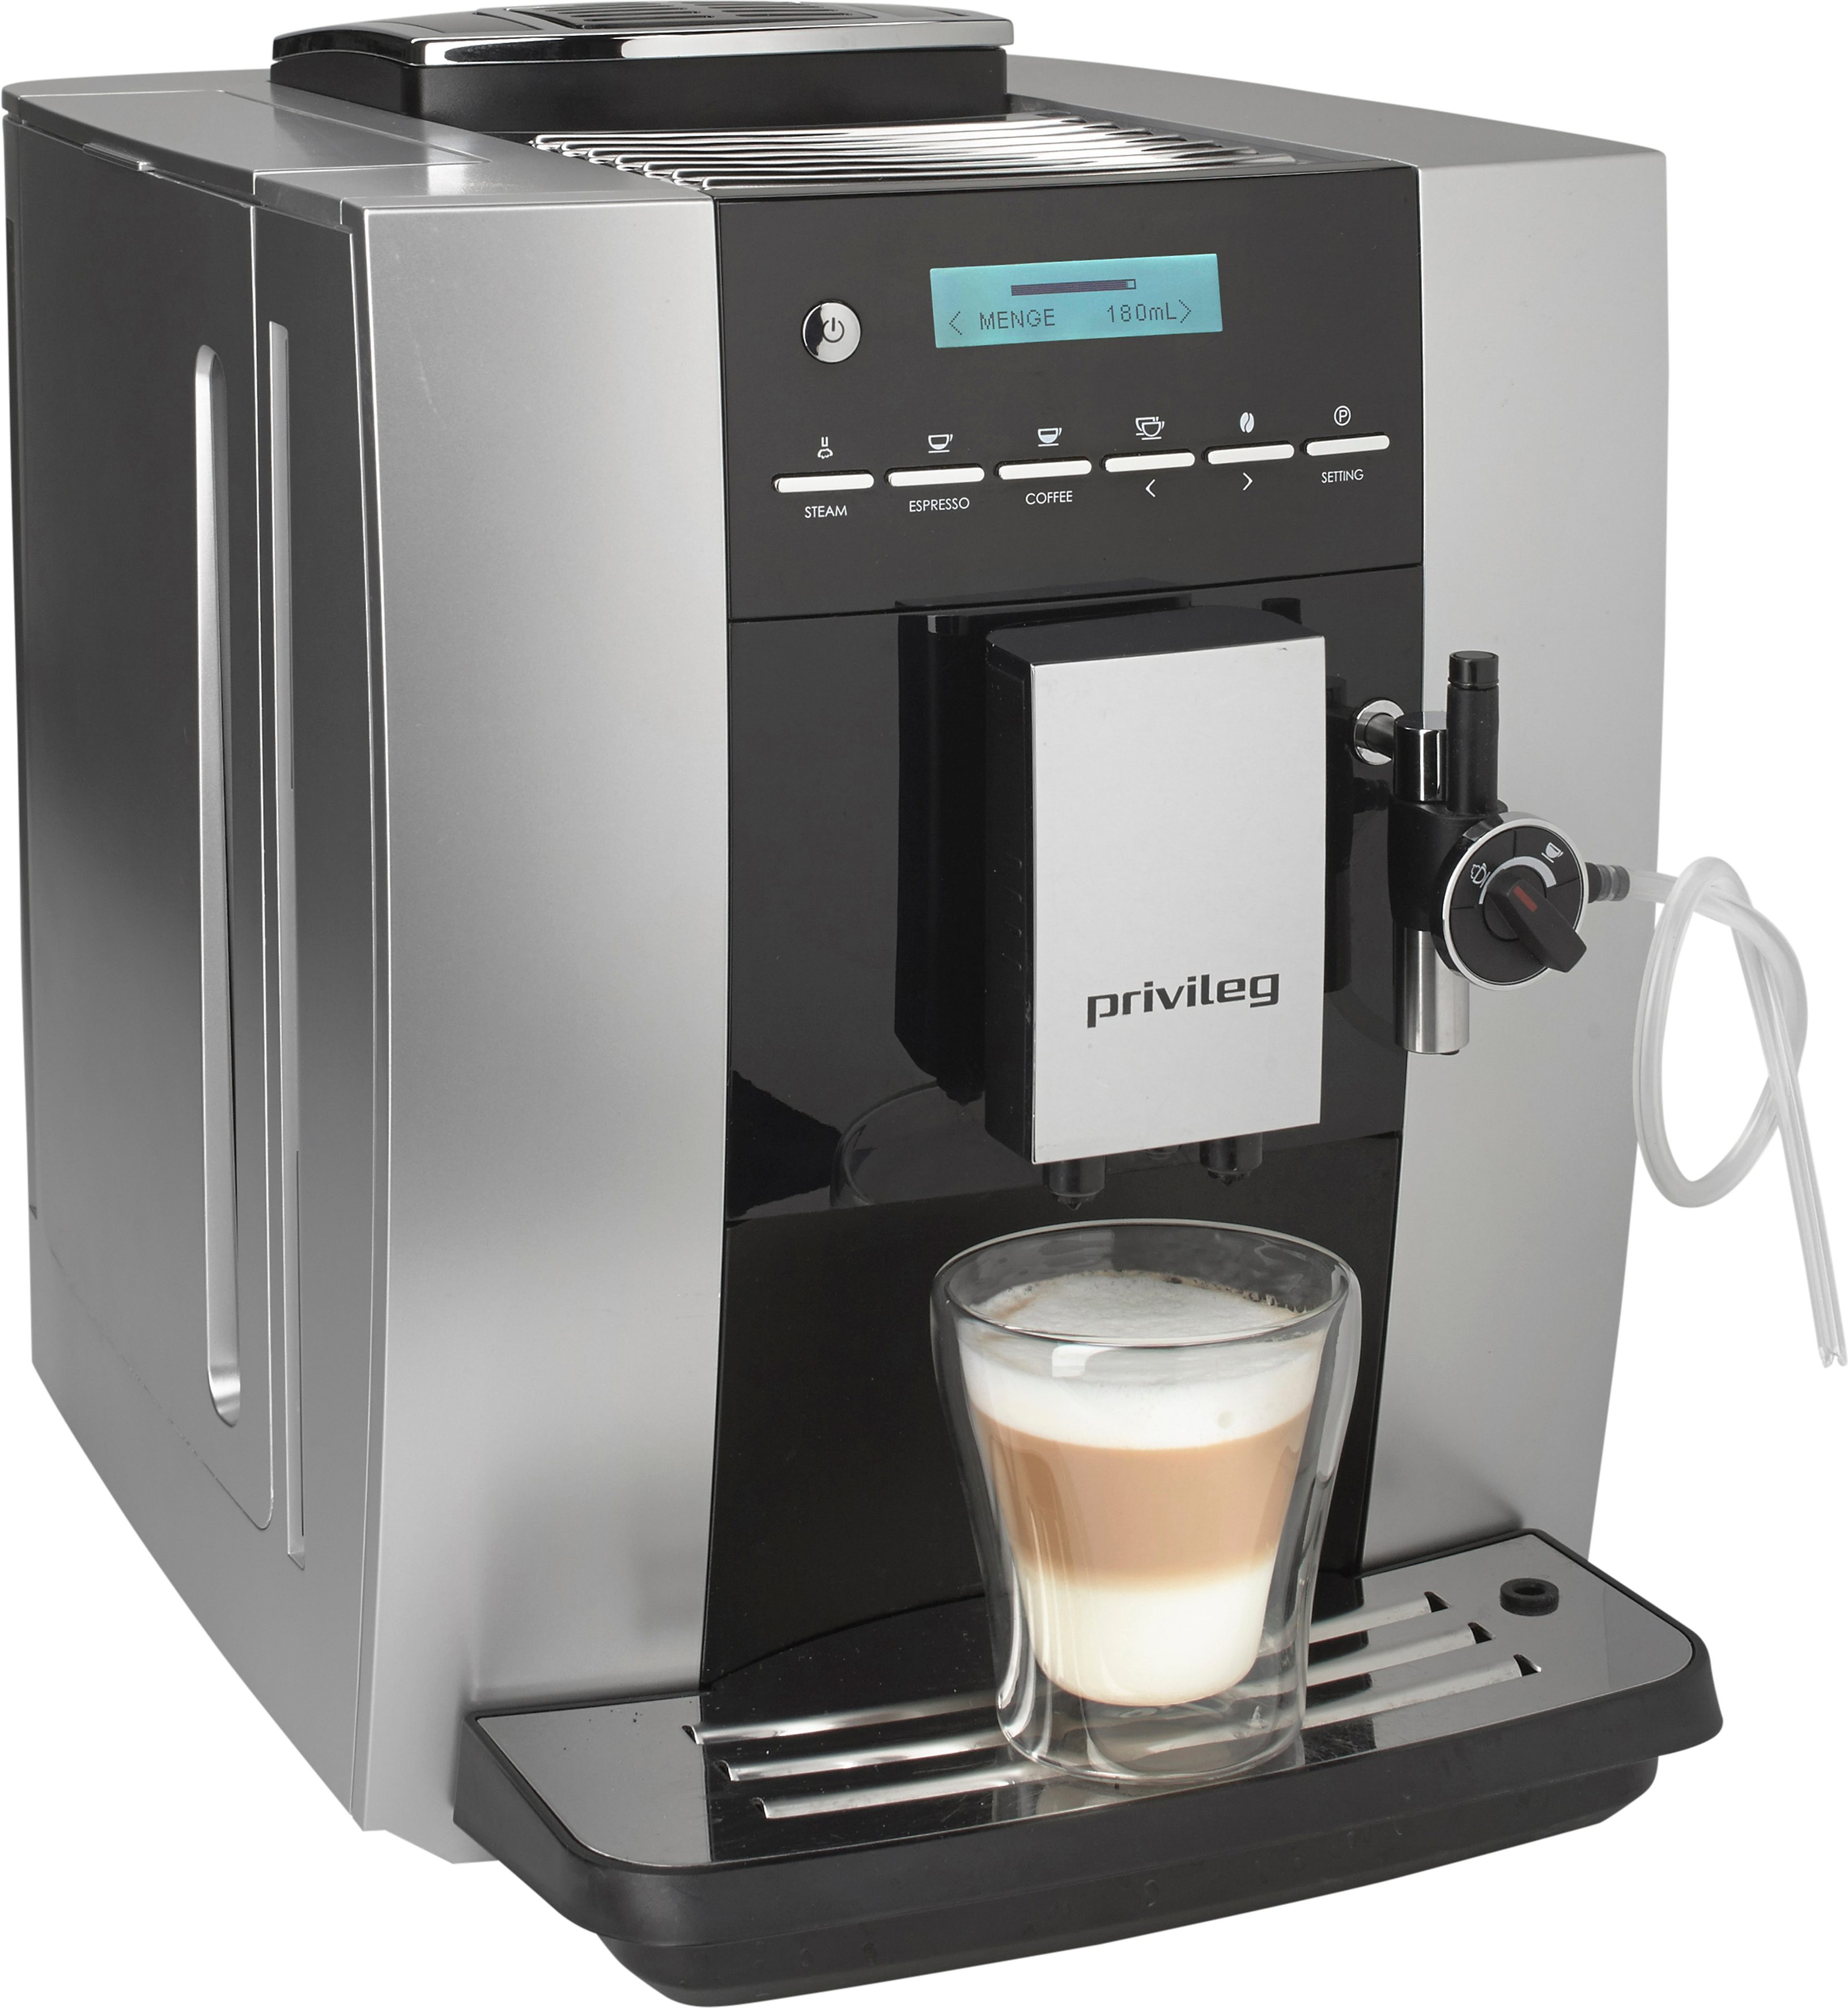 Privileg Kaffeevollautomat KLM1605S, 1,8l Tank, Kegelmahlwerk